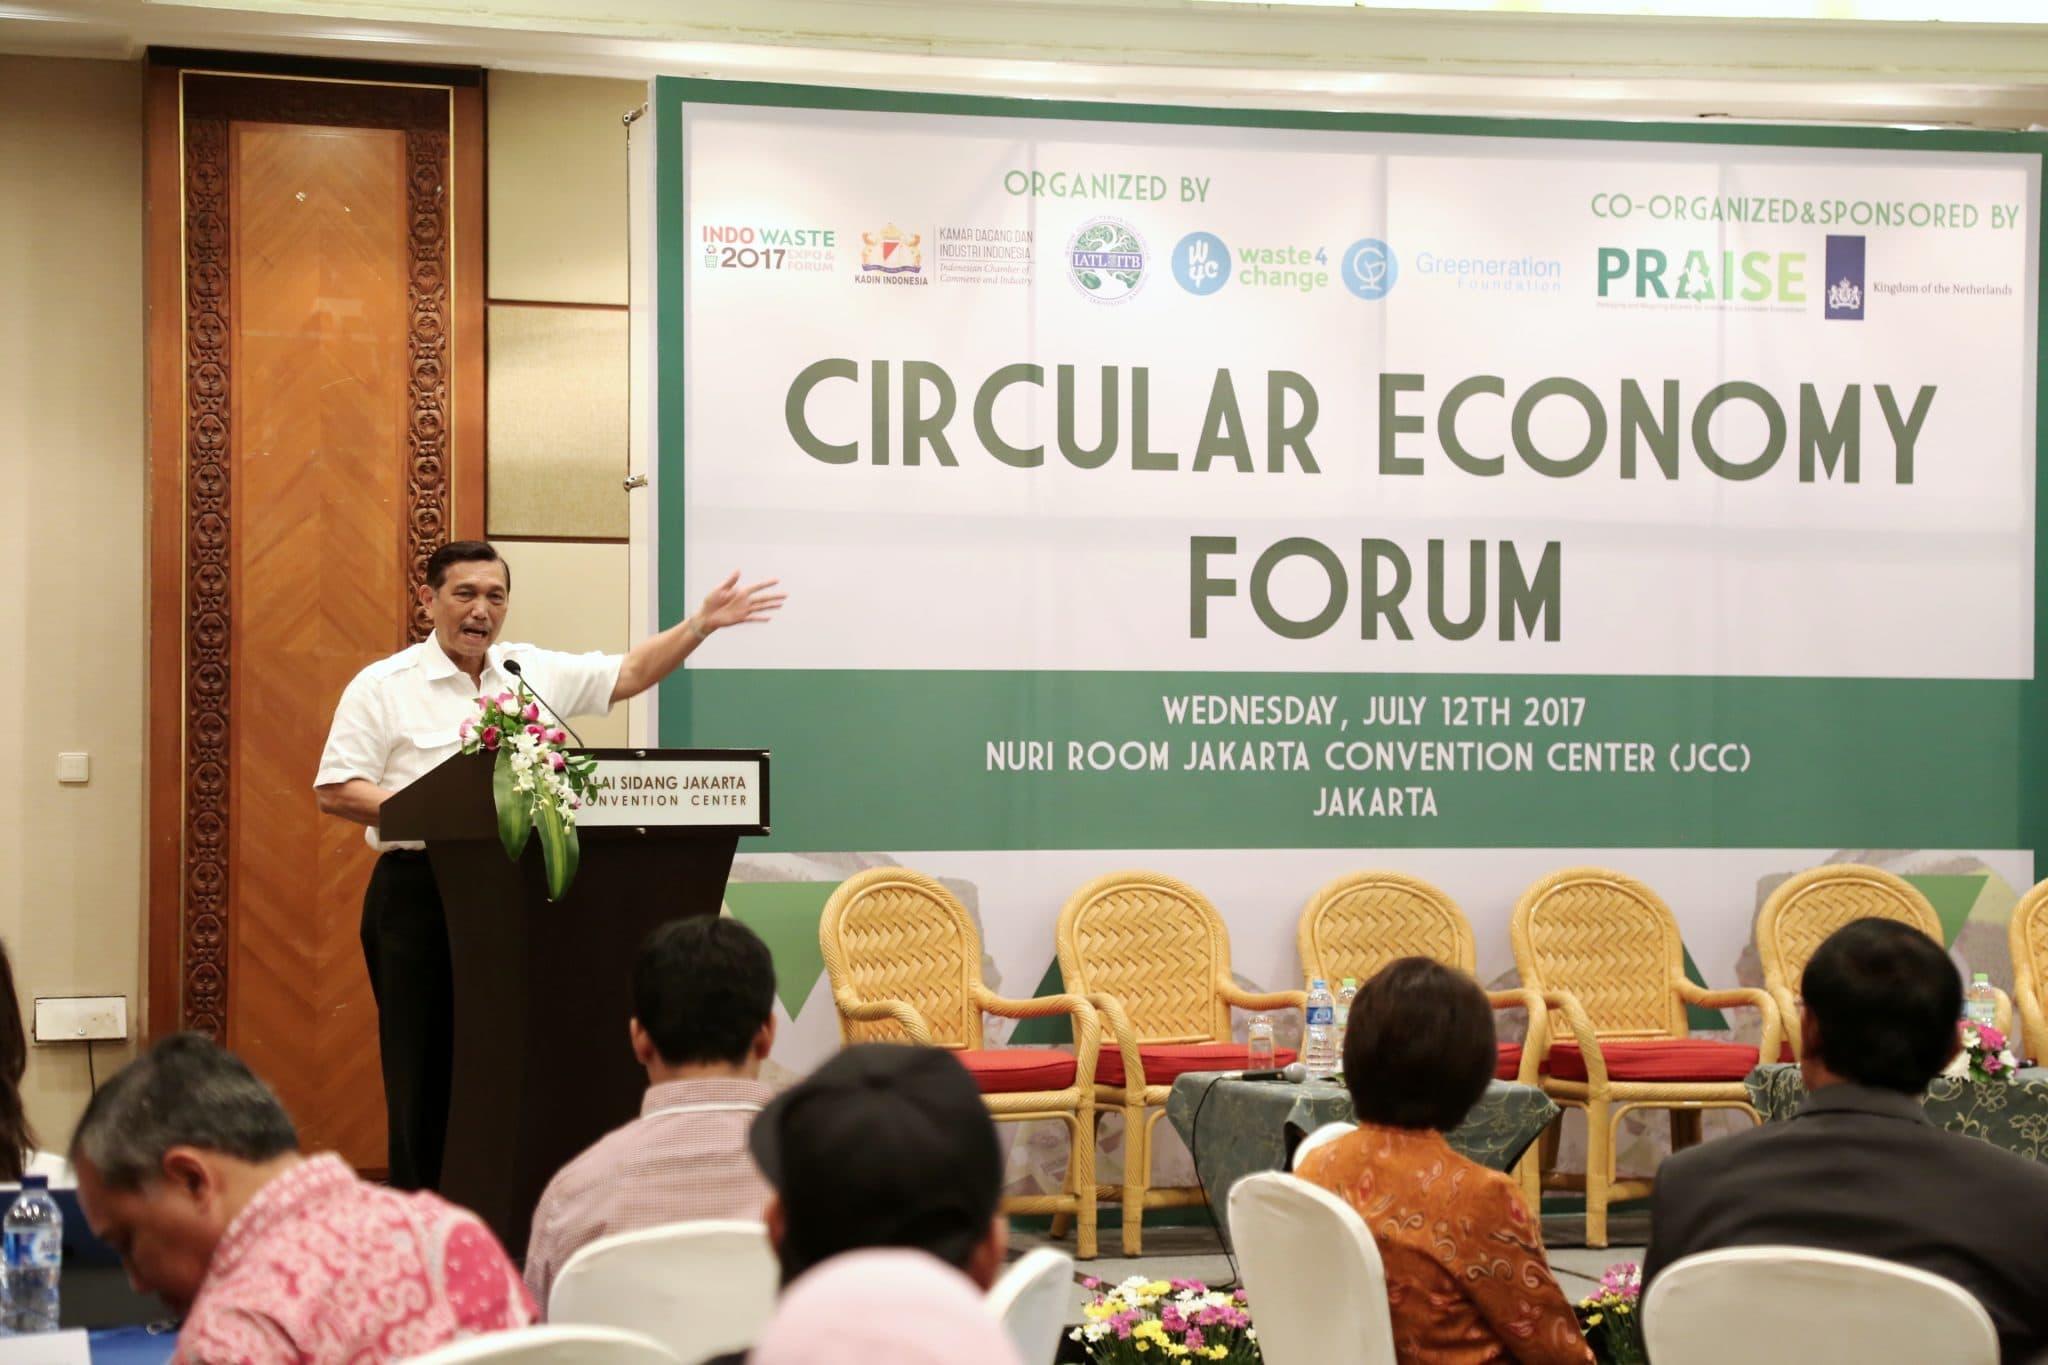 Menko Luhut Keynote Speech pada acara Circular Economy Forum Indo Waste 2017